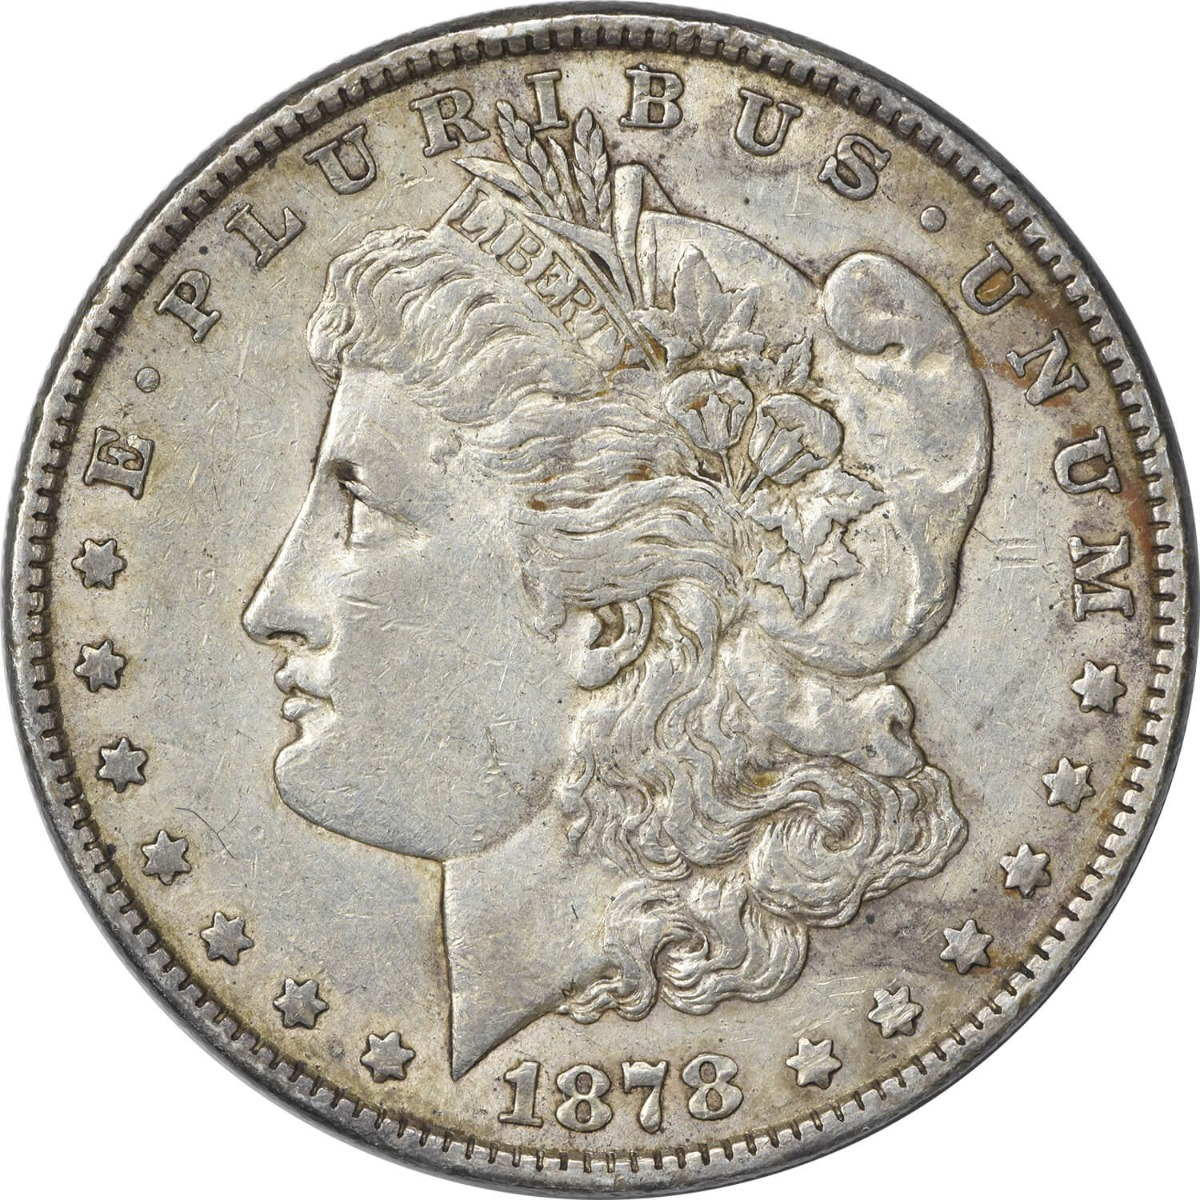 1878 Morgan Silver Dollar 7TF Reverse of 1879 EF Uncertified